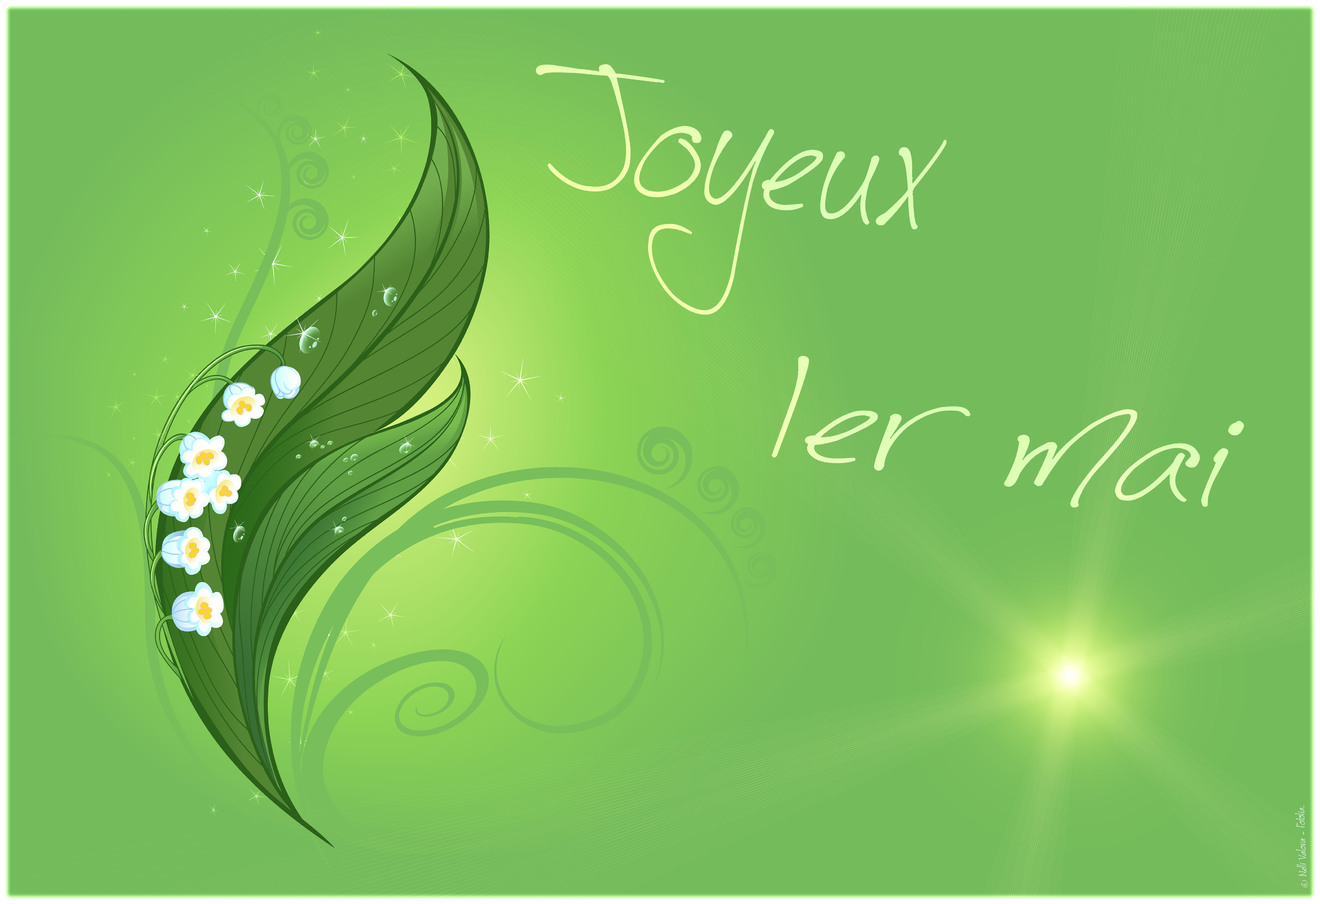 Cartes virtuelles premier mai joyeux - Joliecarte